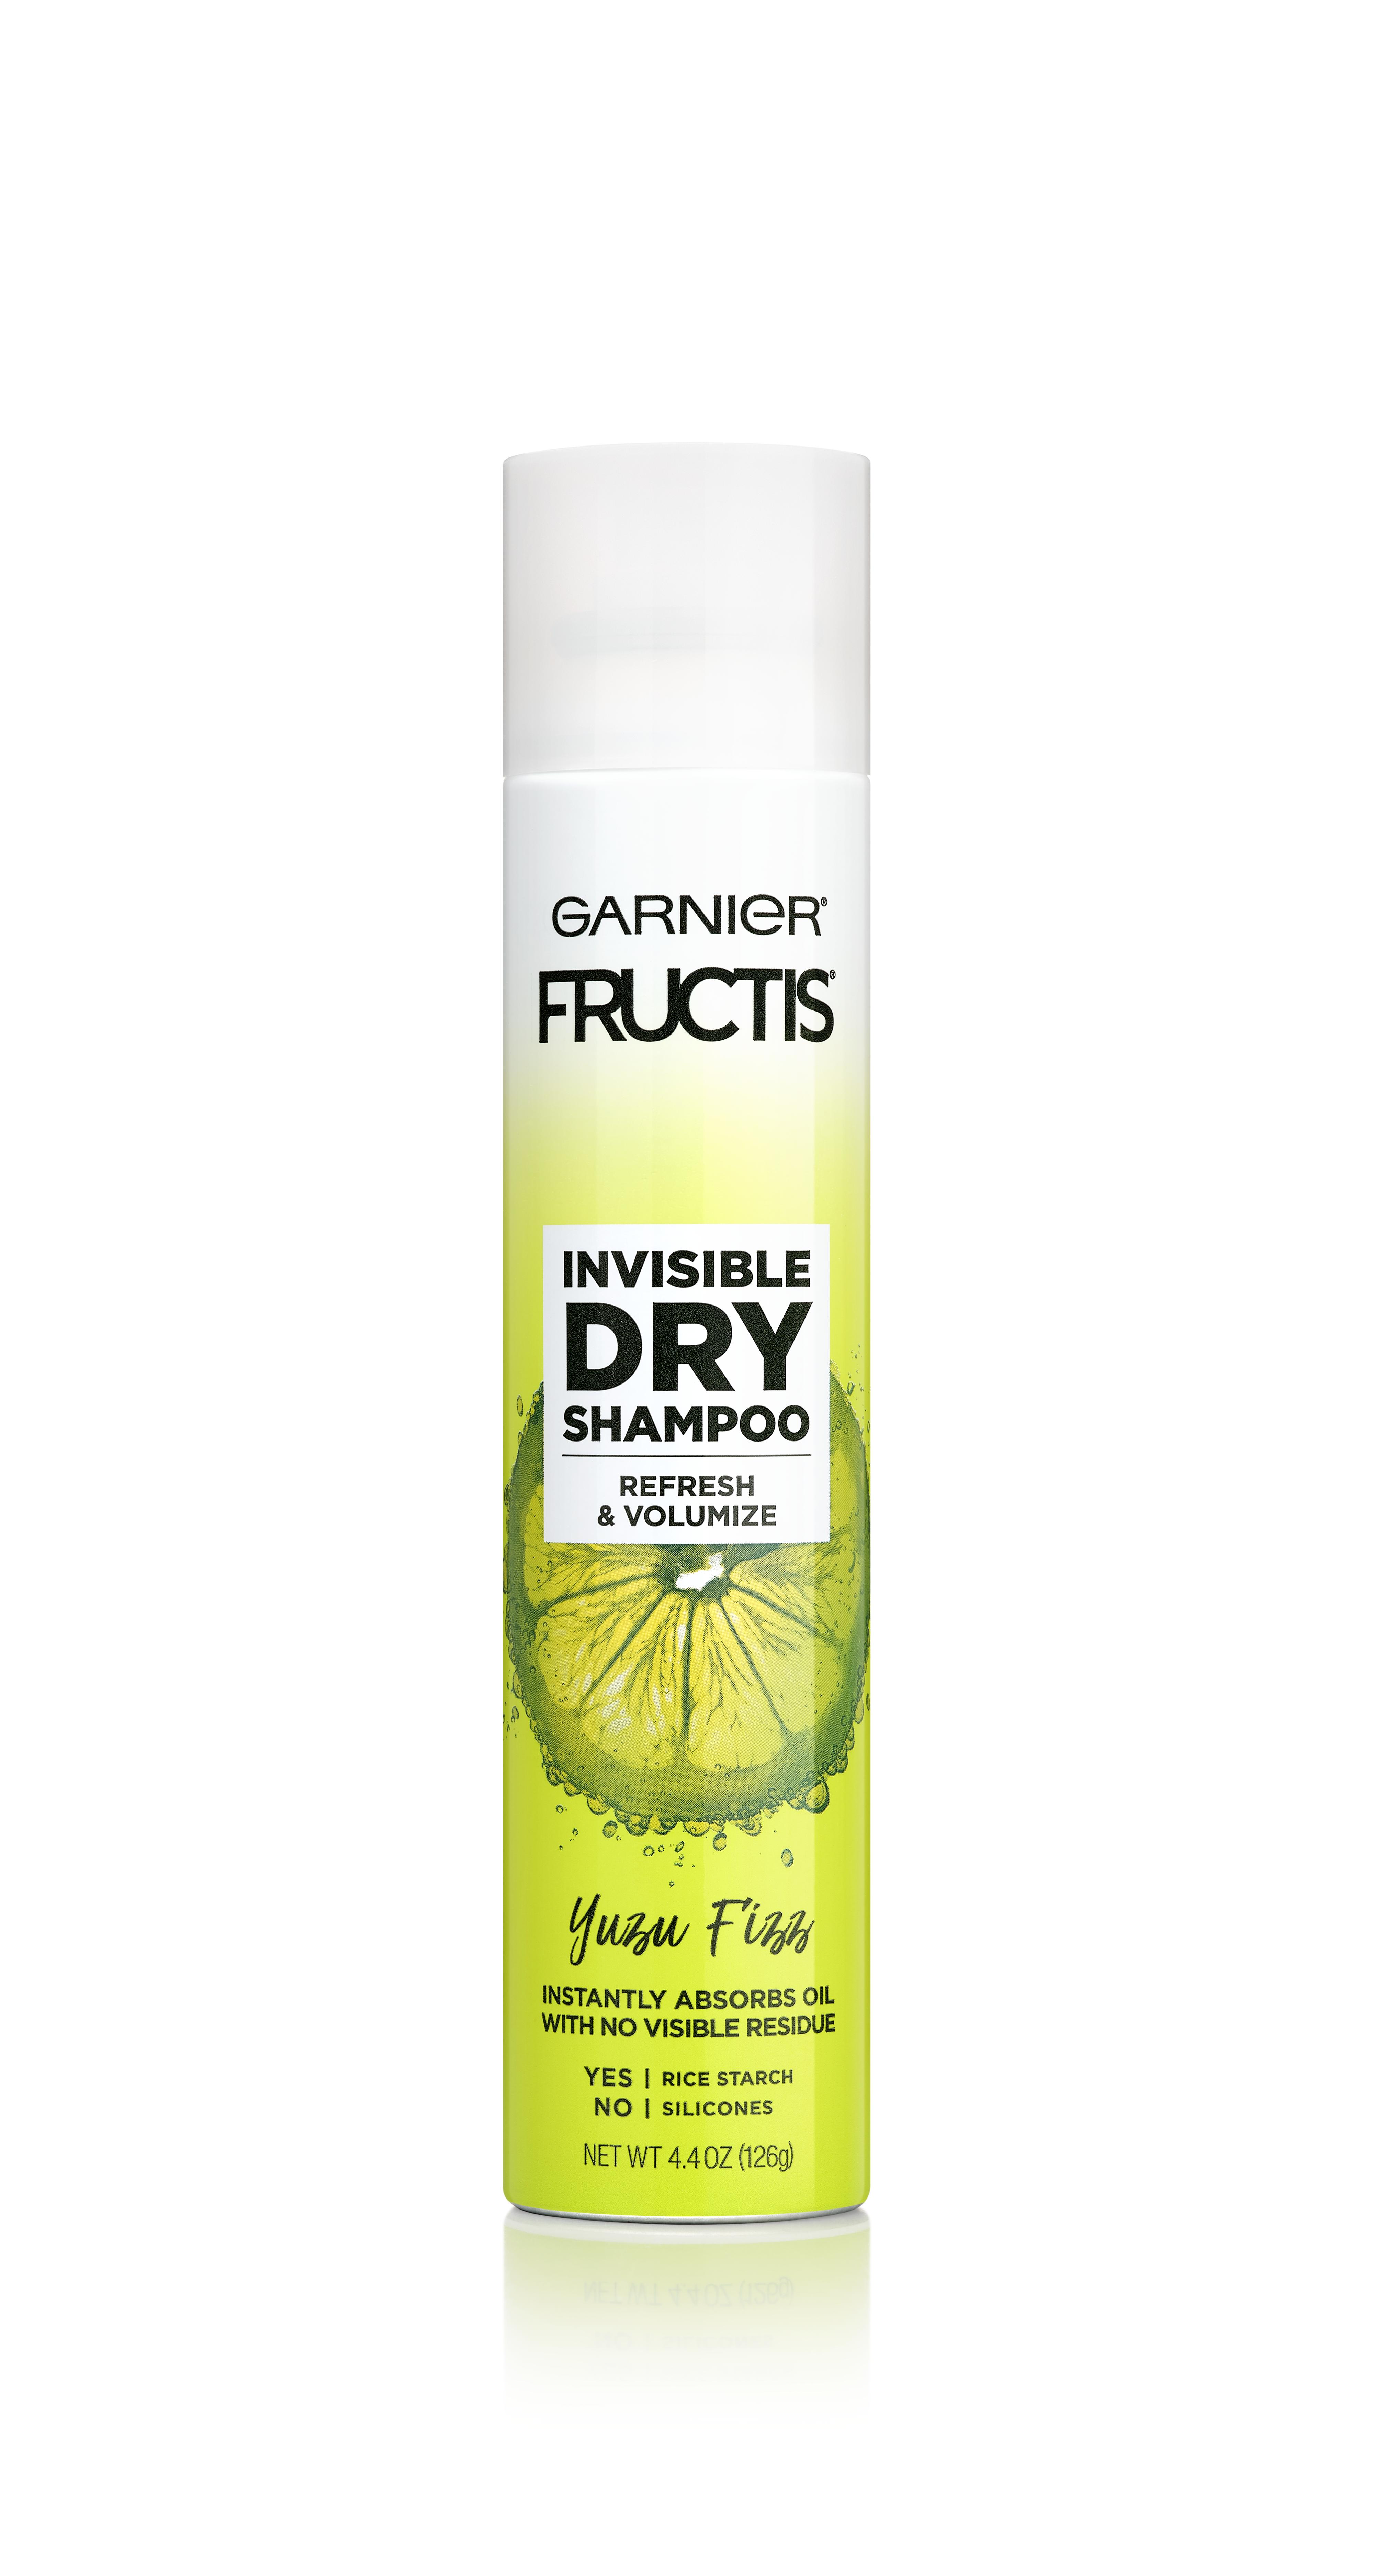 Garnier Fructis Invisible Dry Shampoo Yuzu Fizz